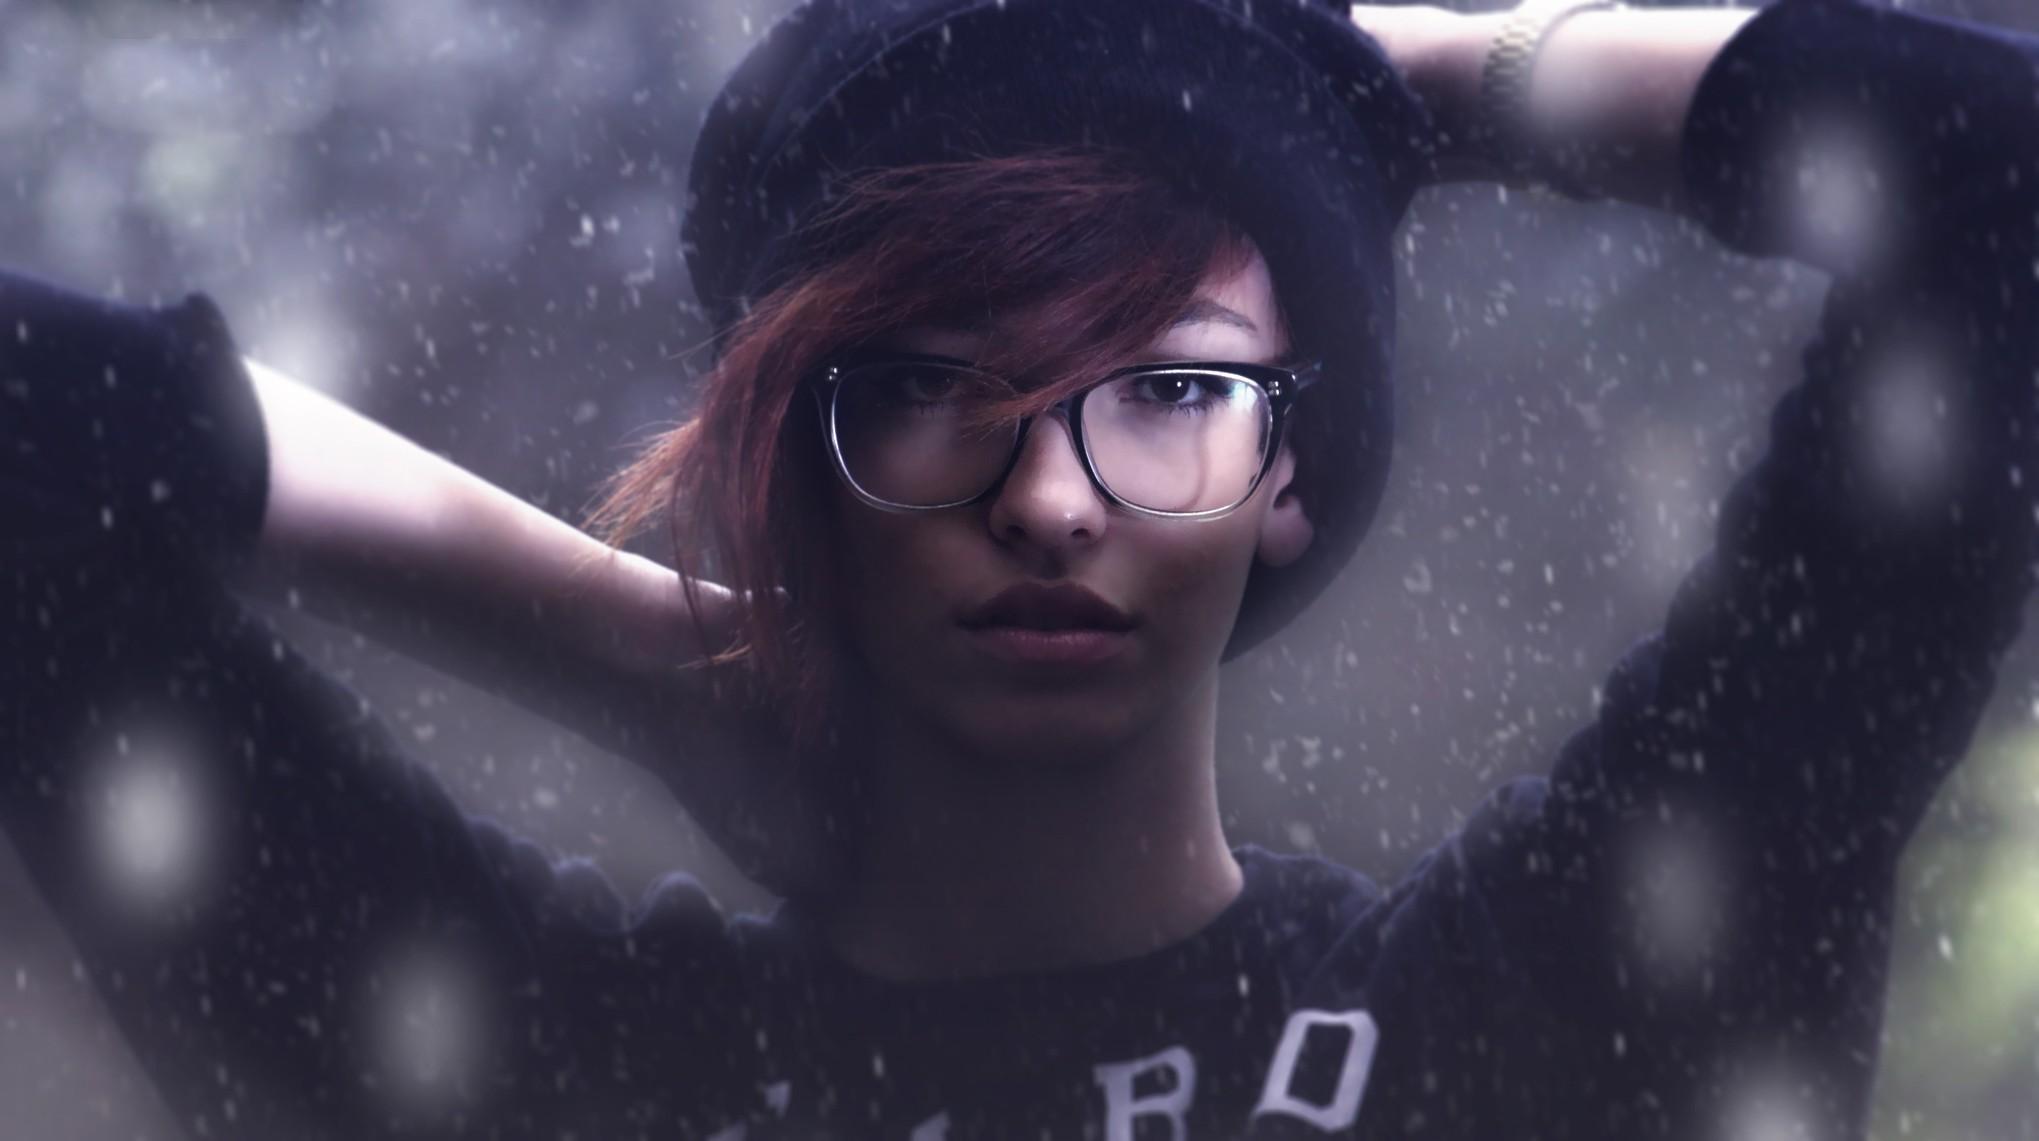 Wallpaper Model Potret Wanita Dengan Kacamata Lengan Ke Atas